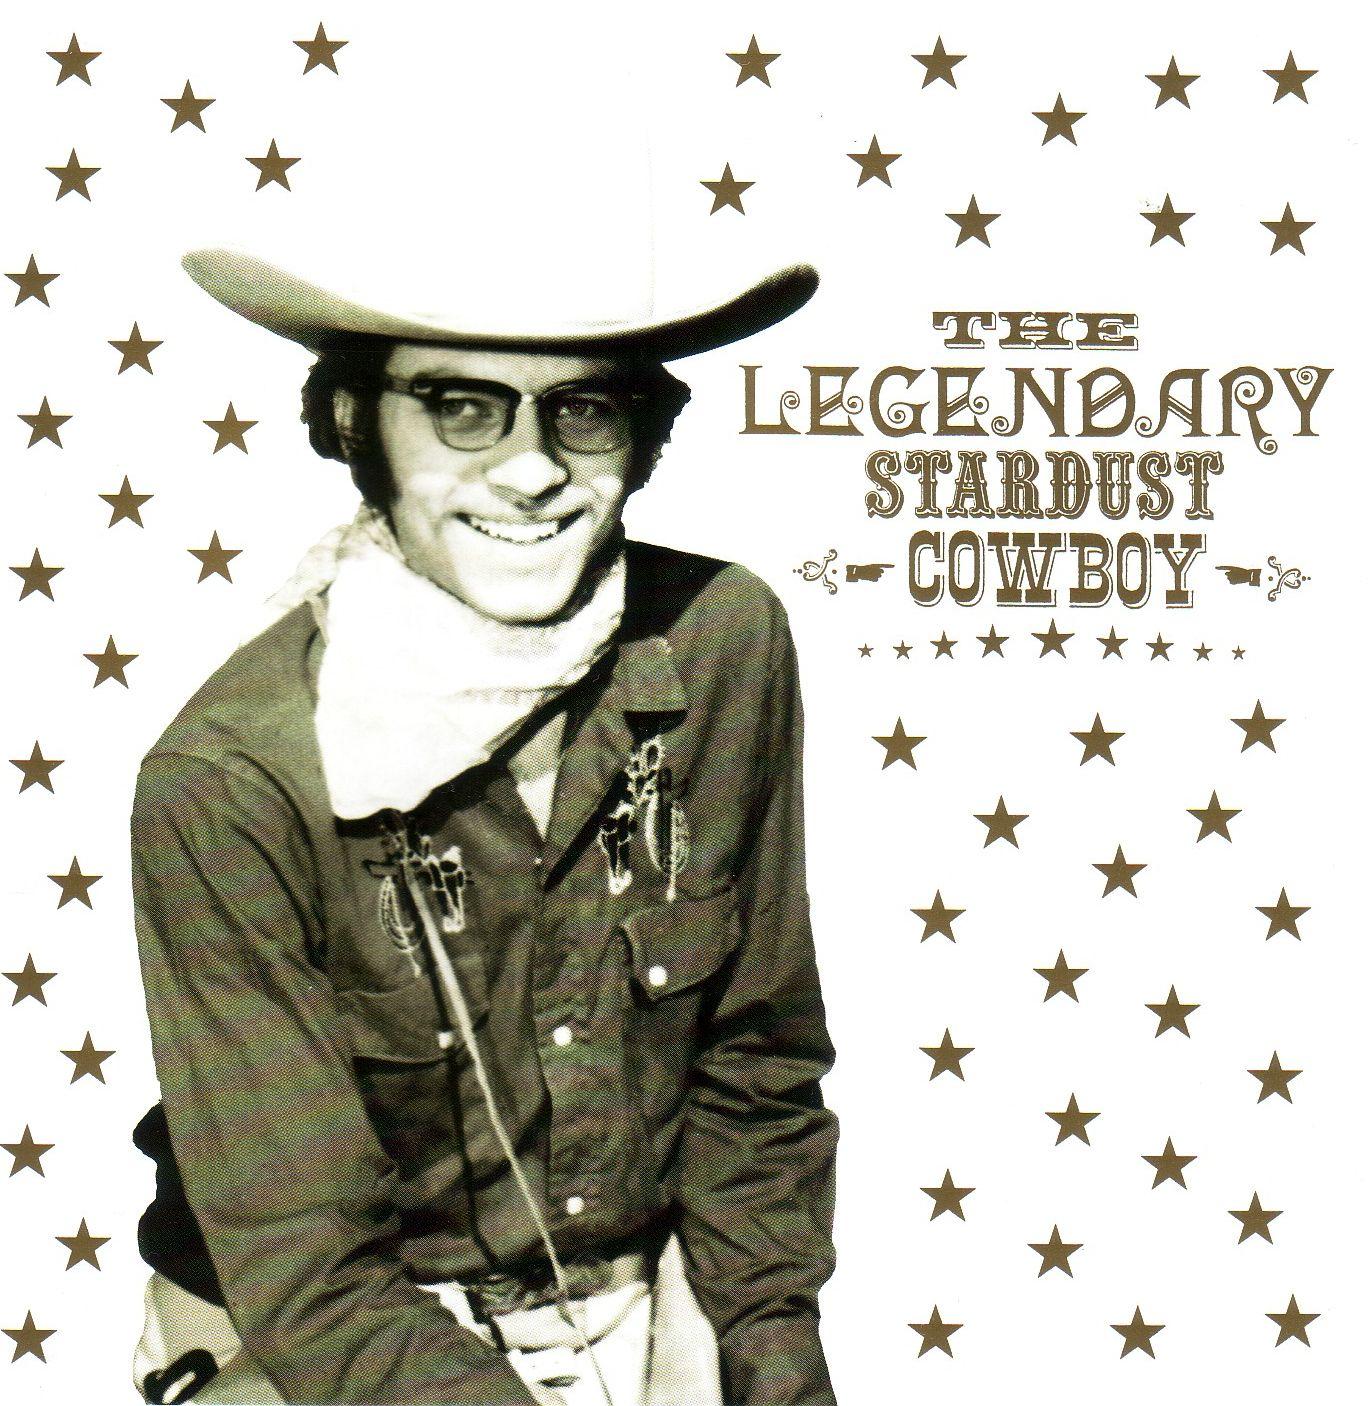 The Legendary Stardust Cowboy - Paralyzed! His Vintage ...